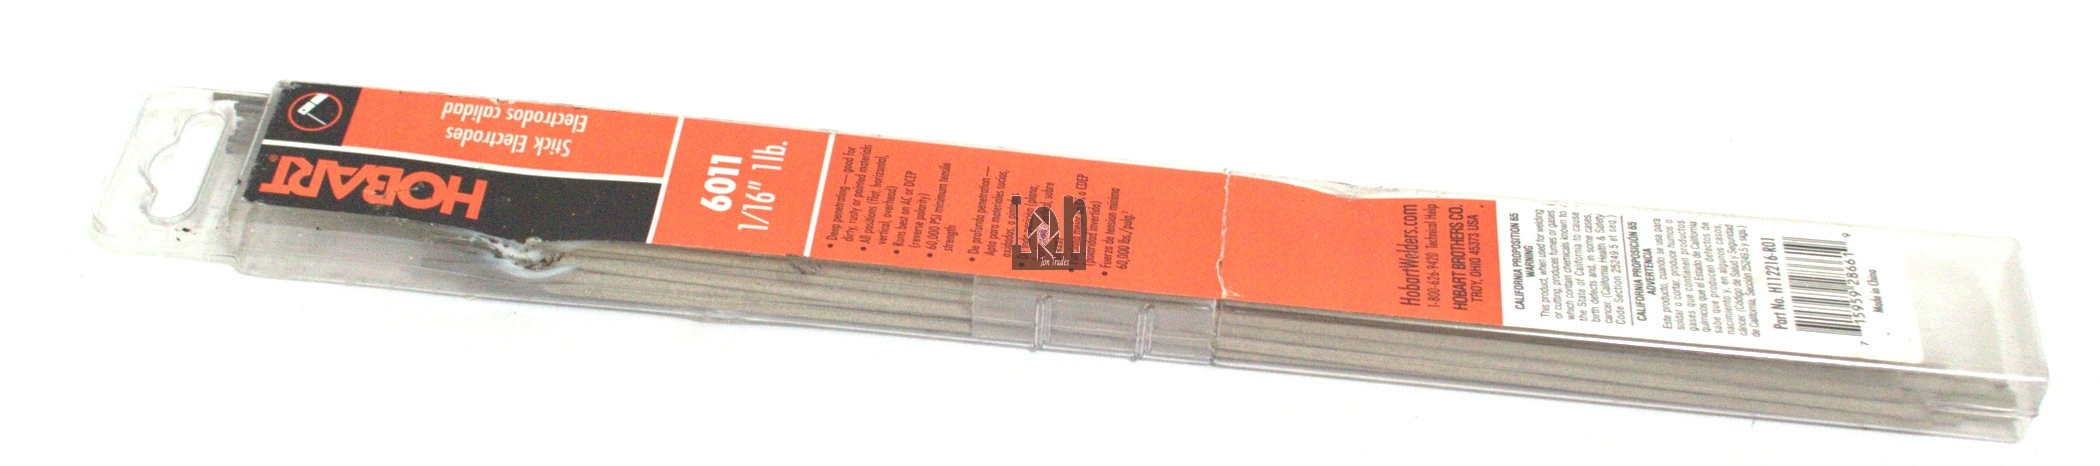 "Hobart 1lb Stick Electrodes 1/16"" 6011 Welking Supplies"